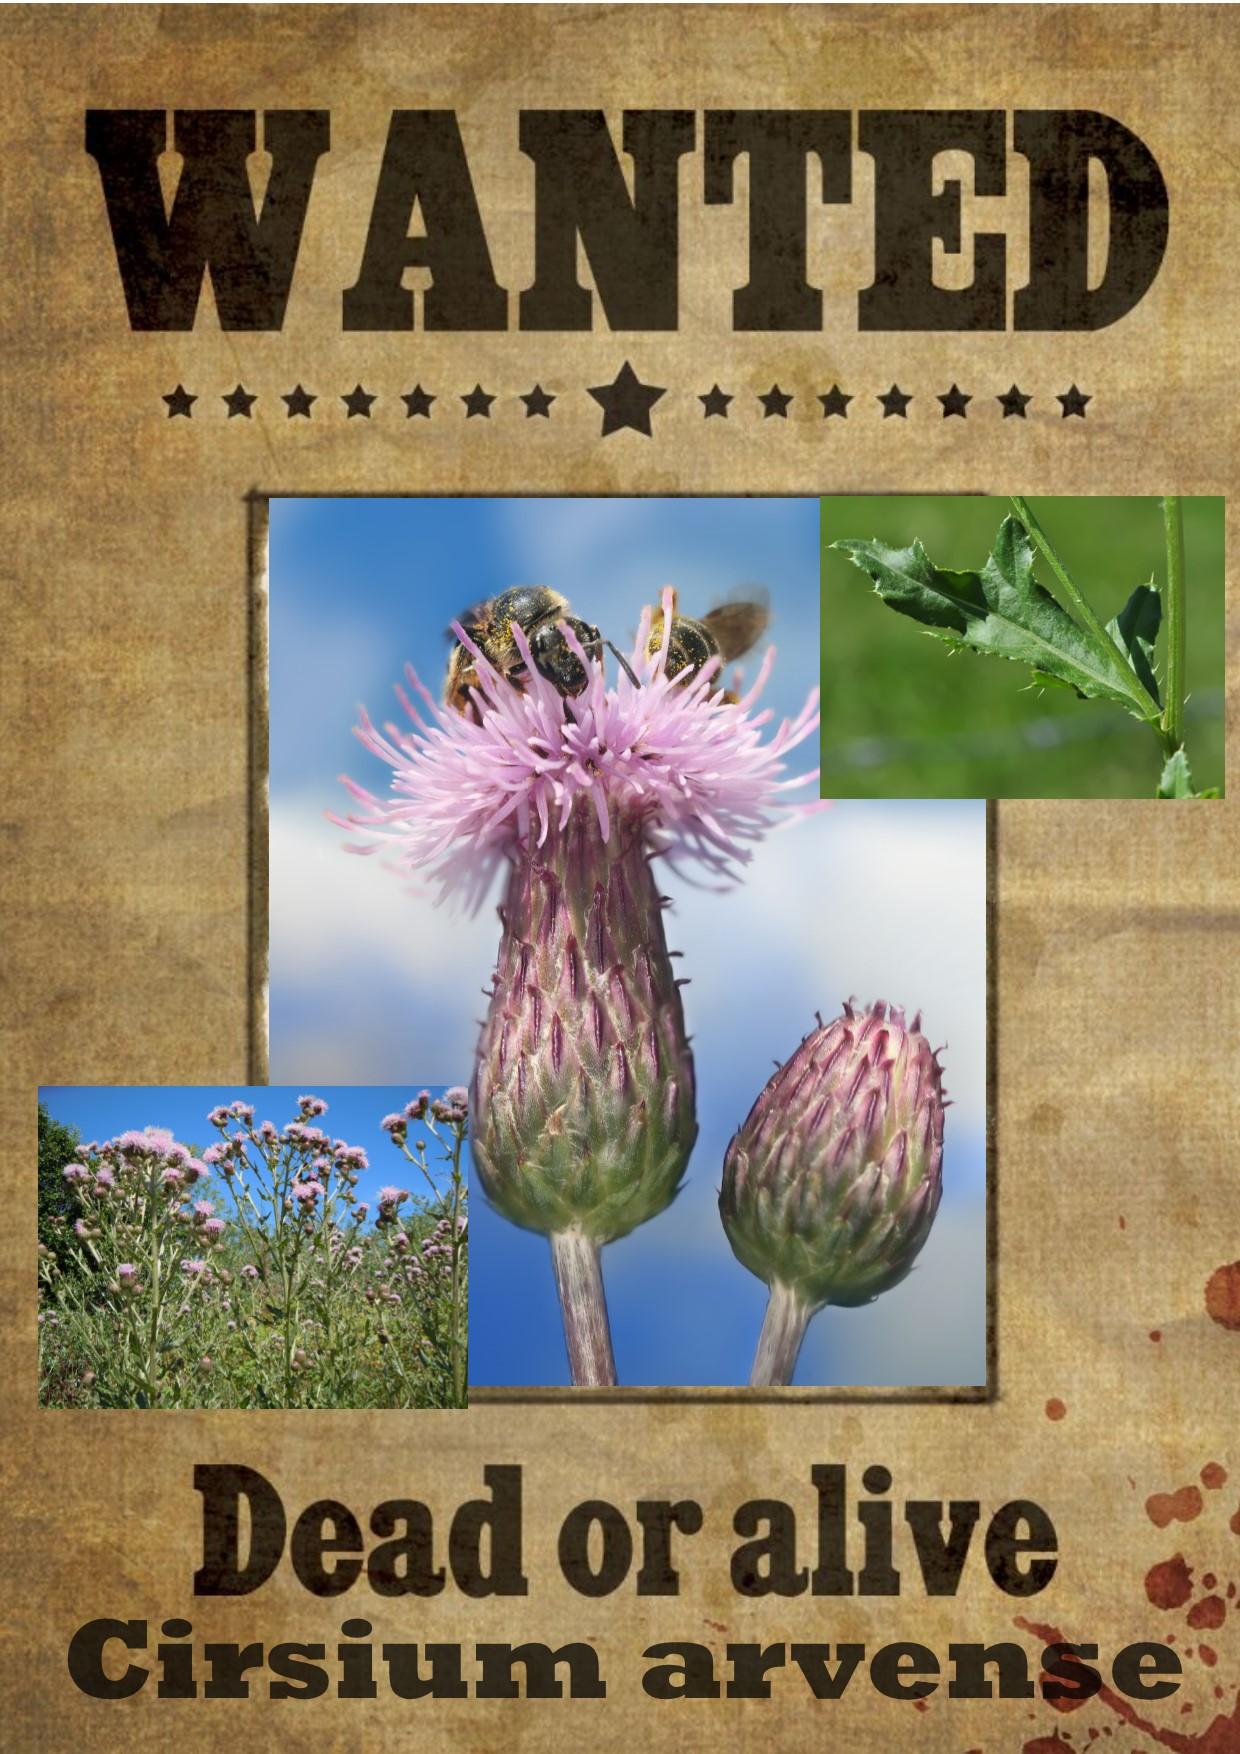 Wanted cirsium arvense 1